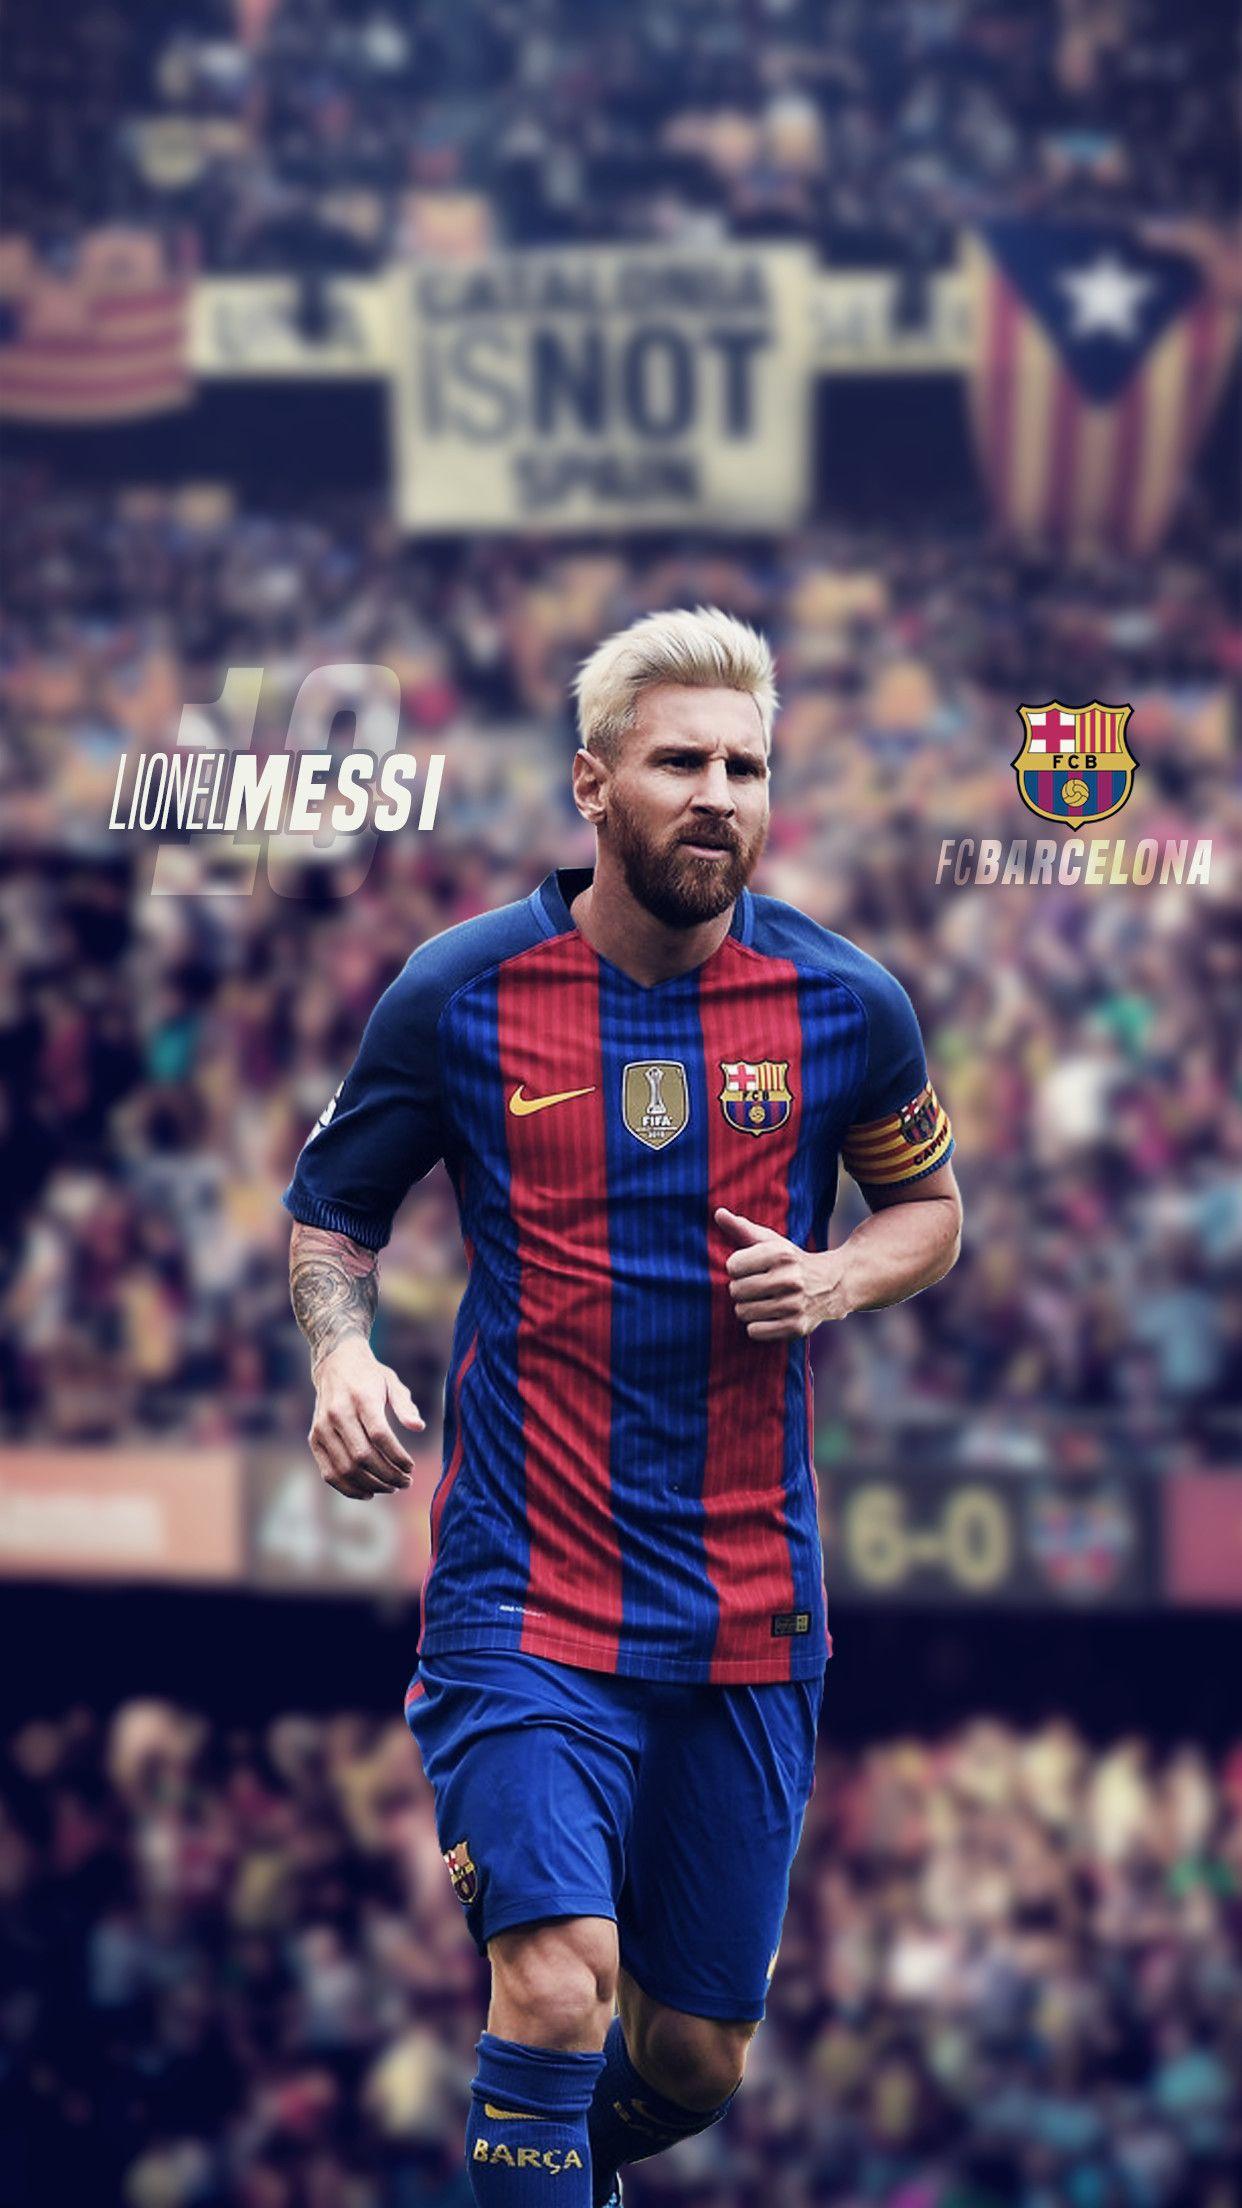 Barcelona Footballer 4k Hd Iphone Wallpapers Wallpaper Cave